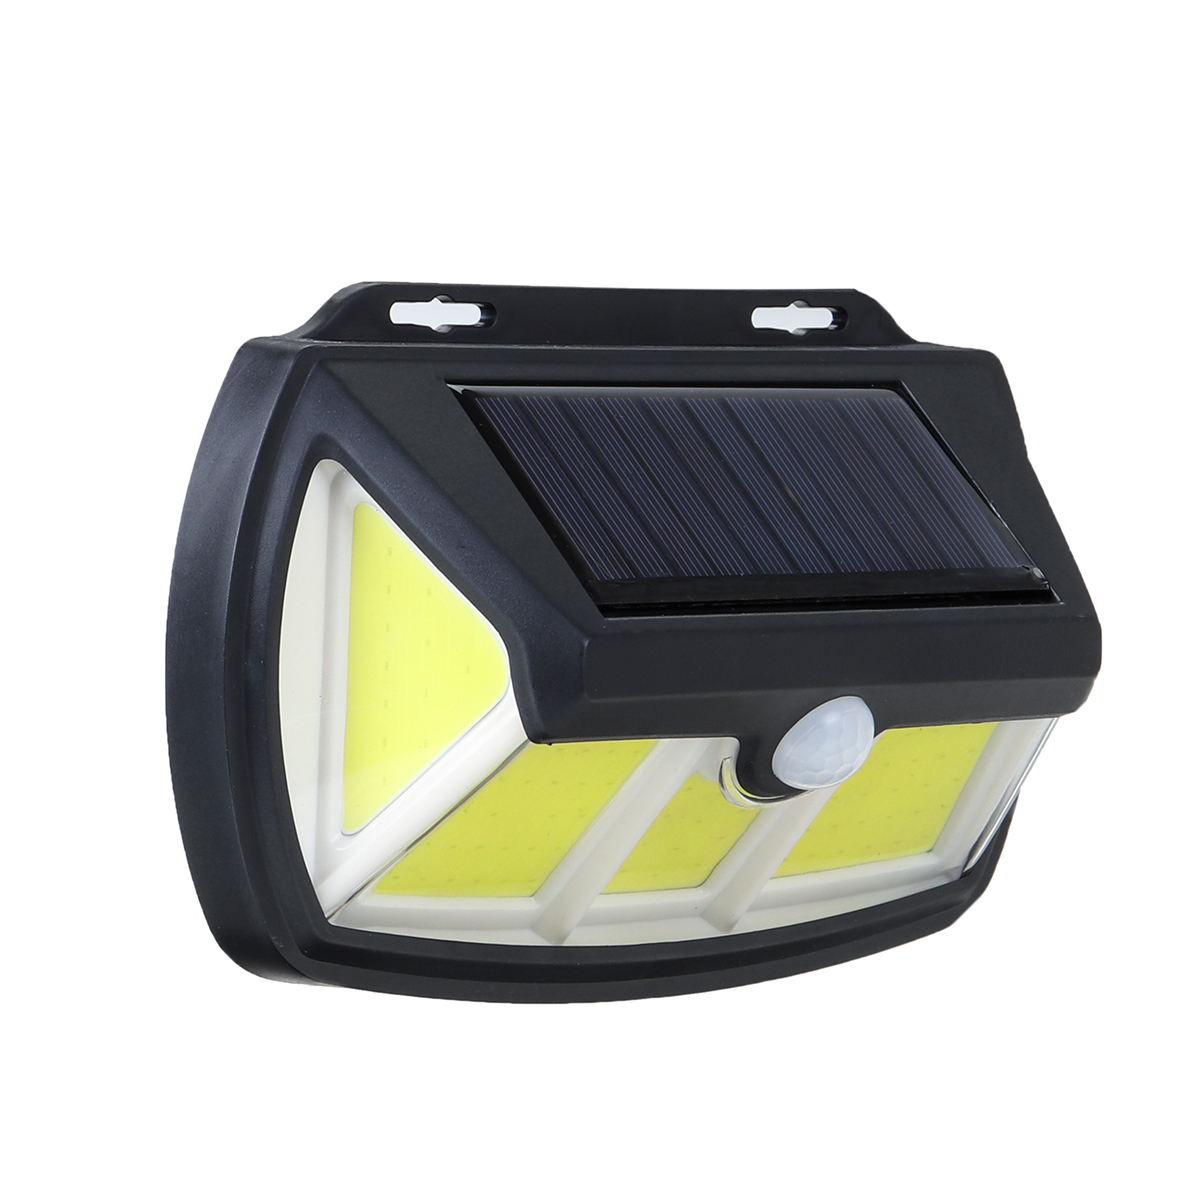 Солнечная Power Wall Light PIR Motion Датчик На открытом воздухе Сад Лампа Водонепроницаемы IP65